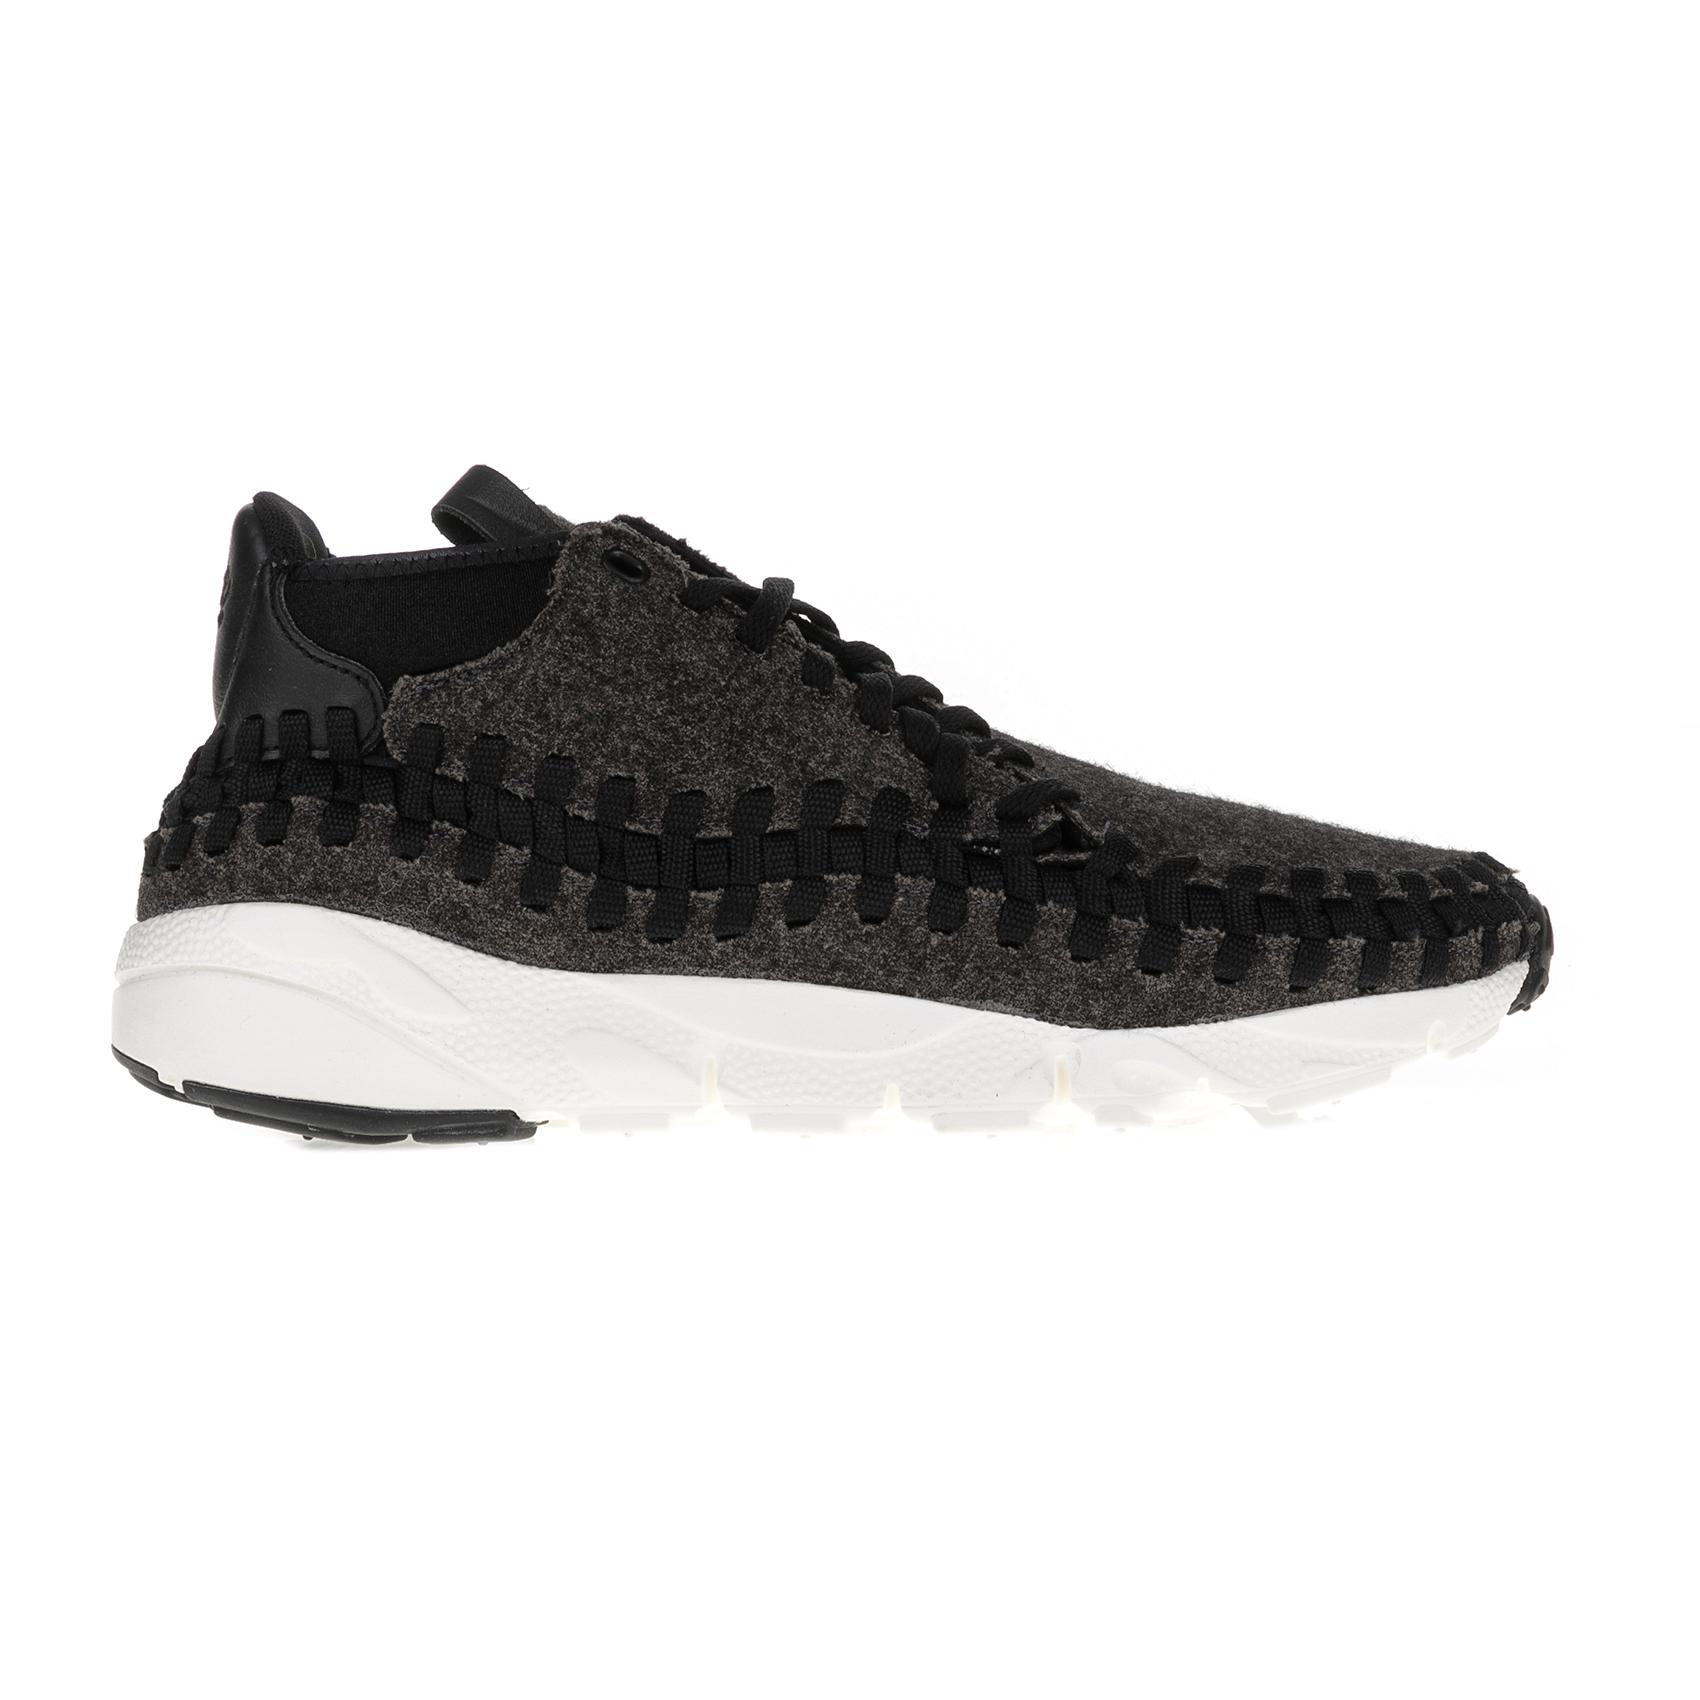 NIKE - Ανδρικά παπούτσια AIR FOOTSCAPE WOVEN CHUKKA μαύρα ανδρικά παπούτσια αθλητικά running